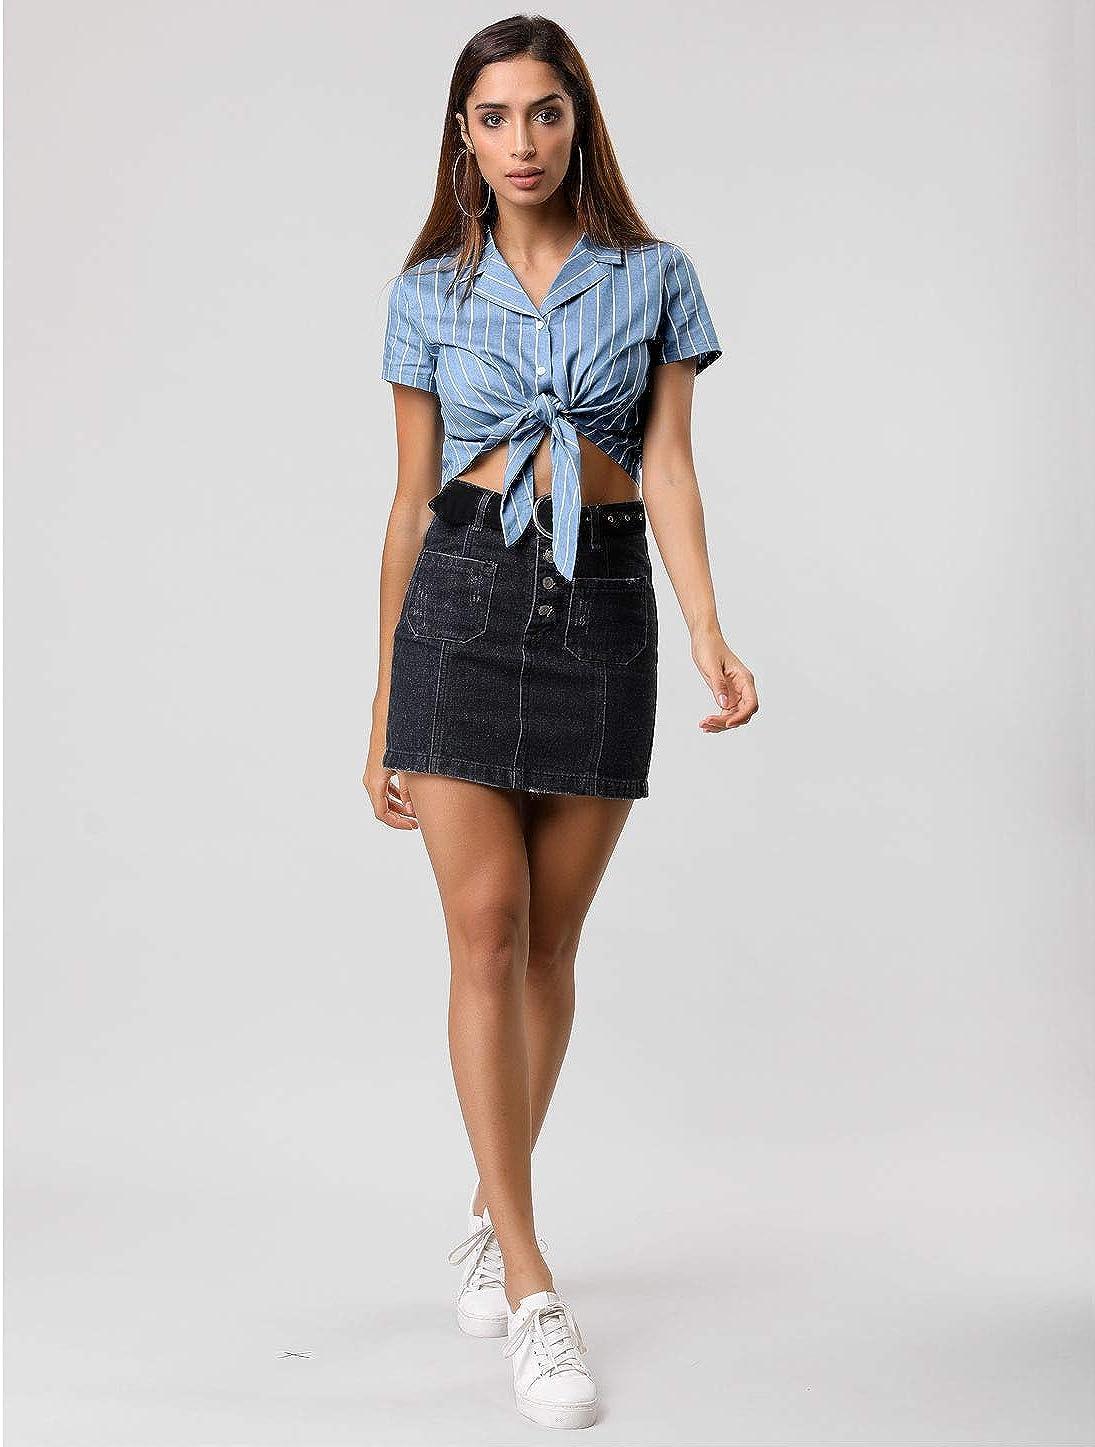 Allegra K Women's Striped Button Up Short Sleeve Tie Front Crop Shirt